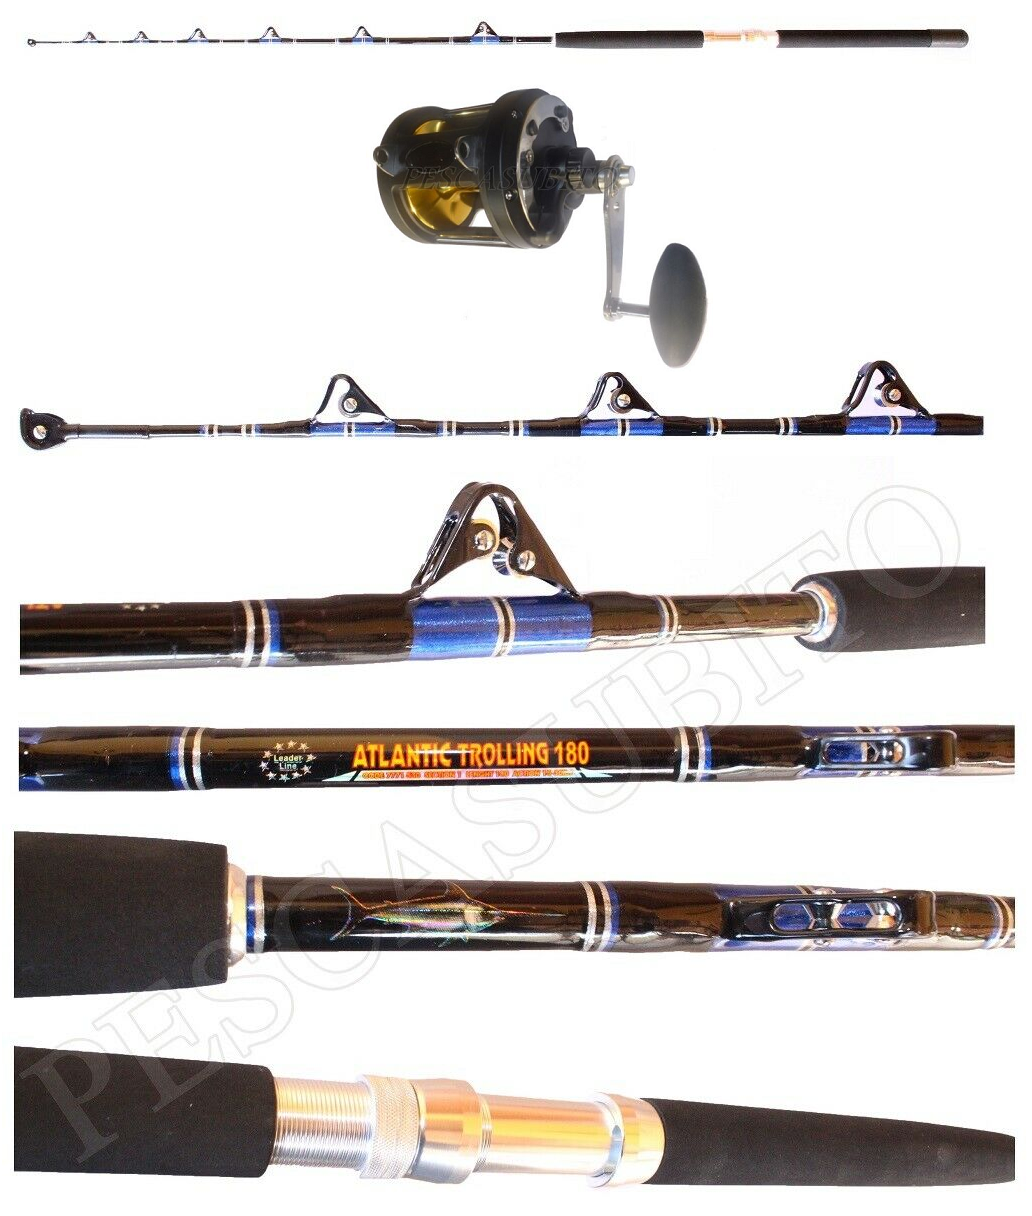 Kit Canna Atlantic Trolling 1530Lbs  Mulinello Pesca Traina Tonno Drifting EH